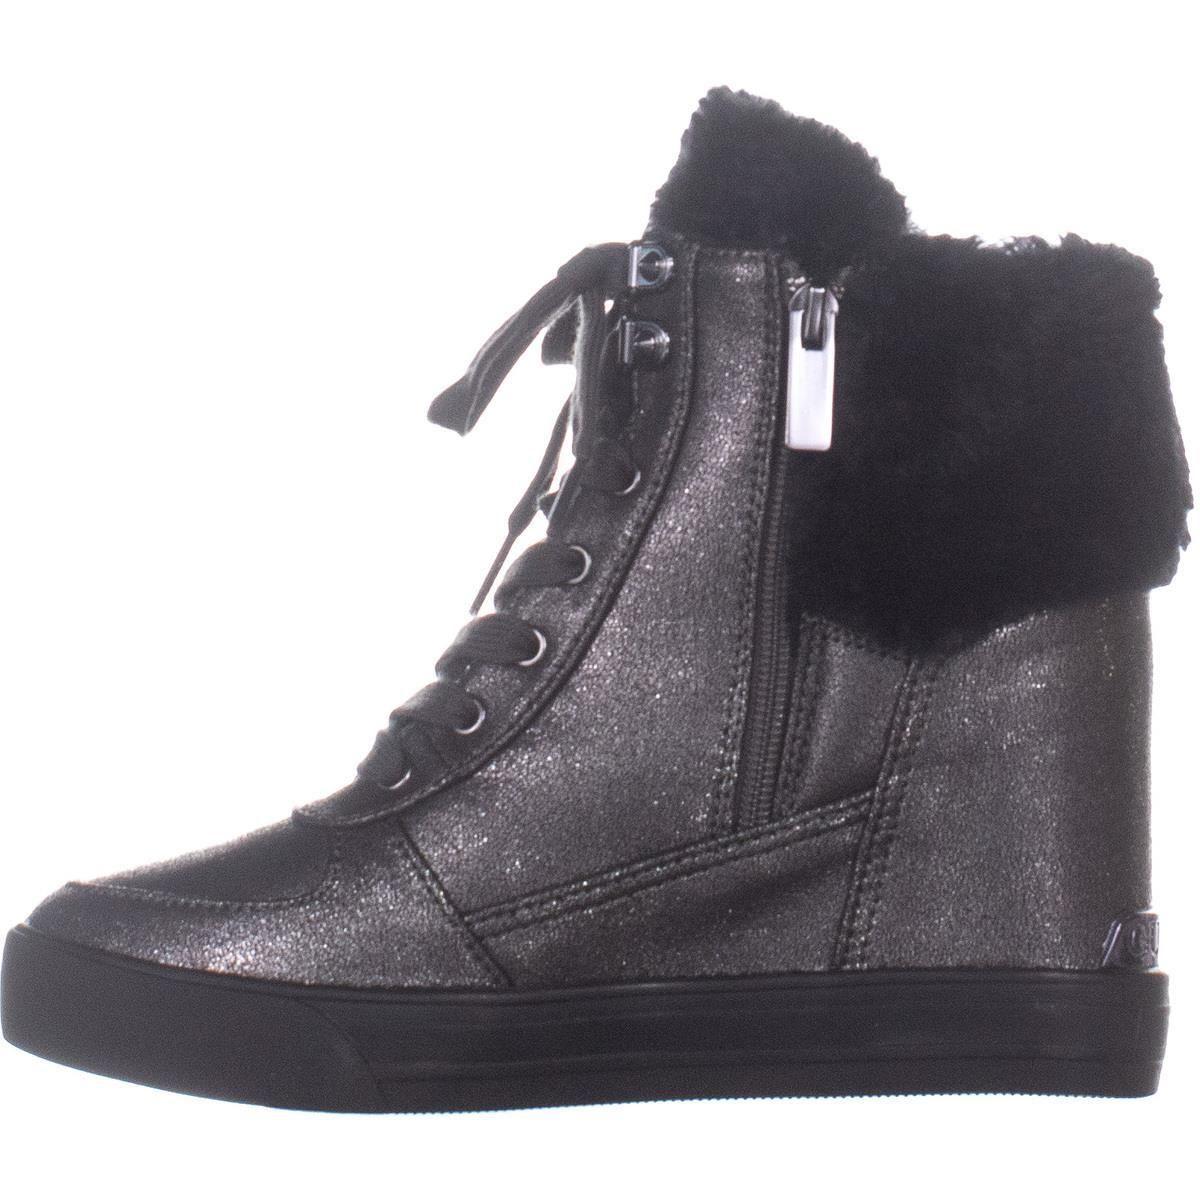 75d0c6c7428 Guess - Multicolor Dustyn Hidden-wedge Fashion Sneakers - Lyst. View  fullscreen